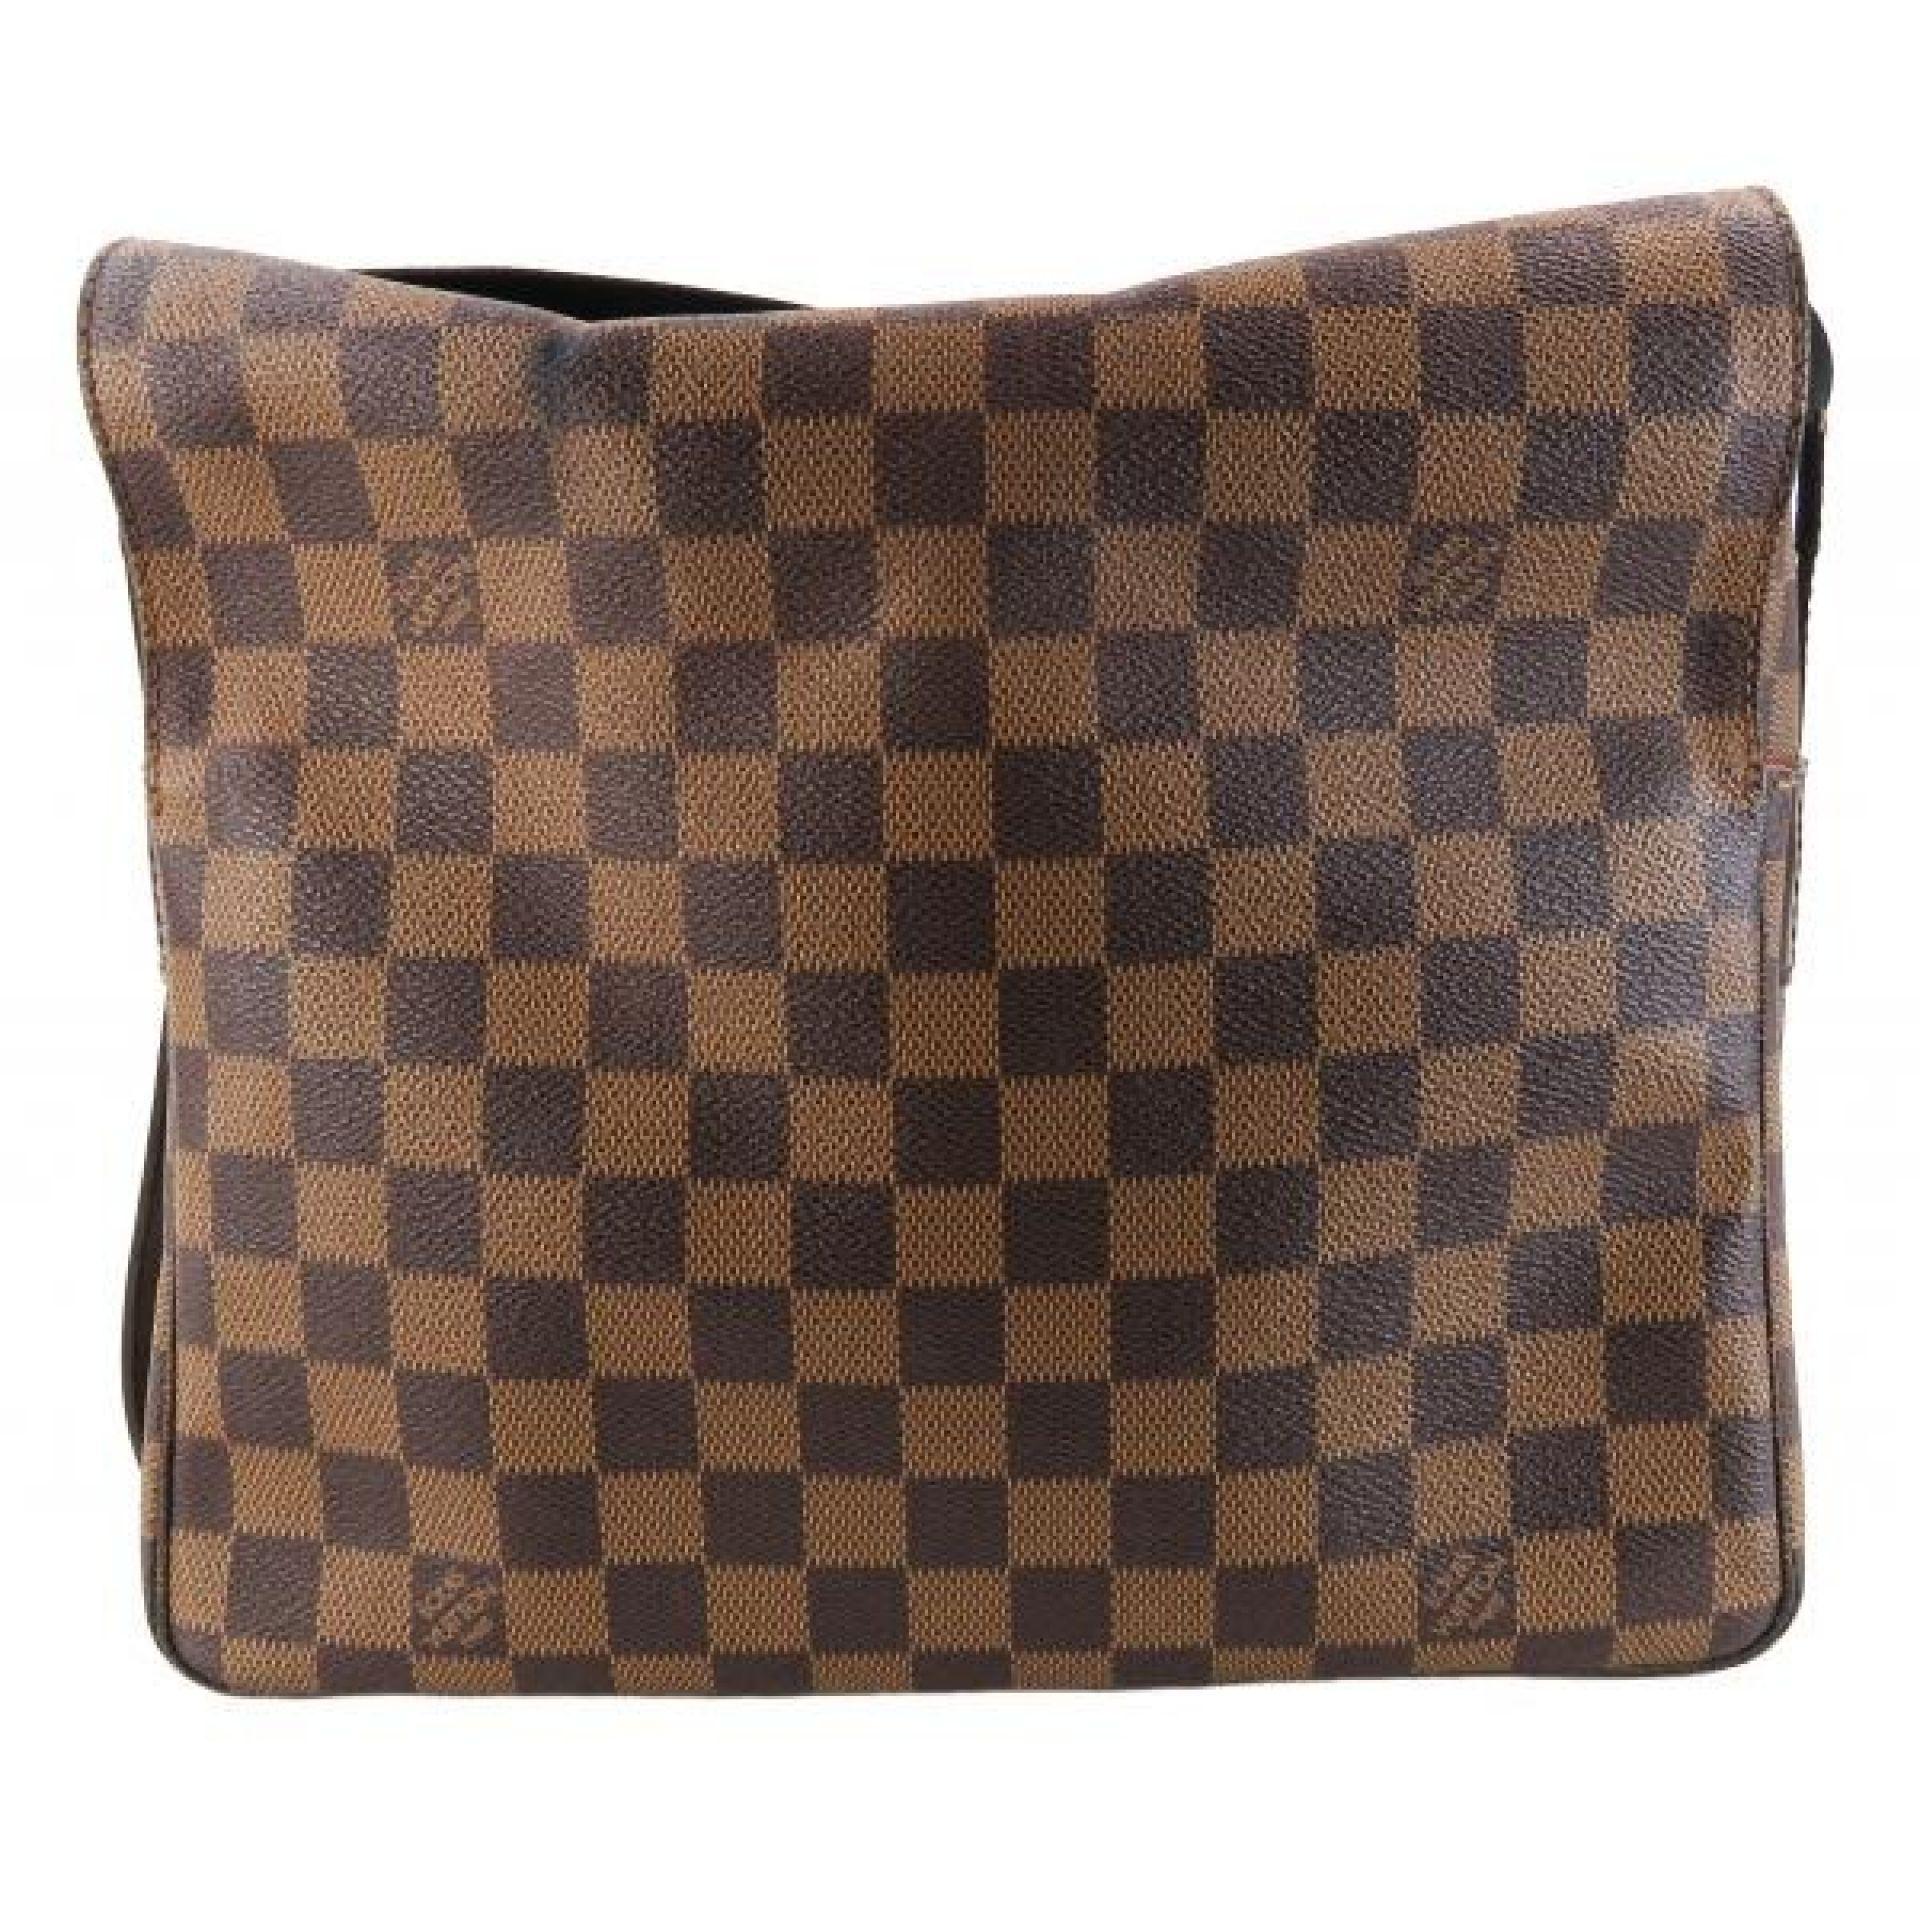 Louis Vuitton Brown Ebene Damier Canvas Naviglio Crossbody Messenger Bag